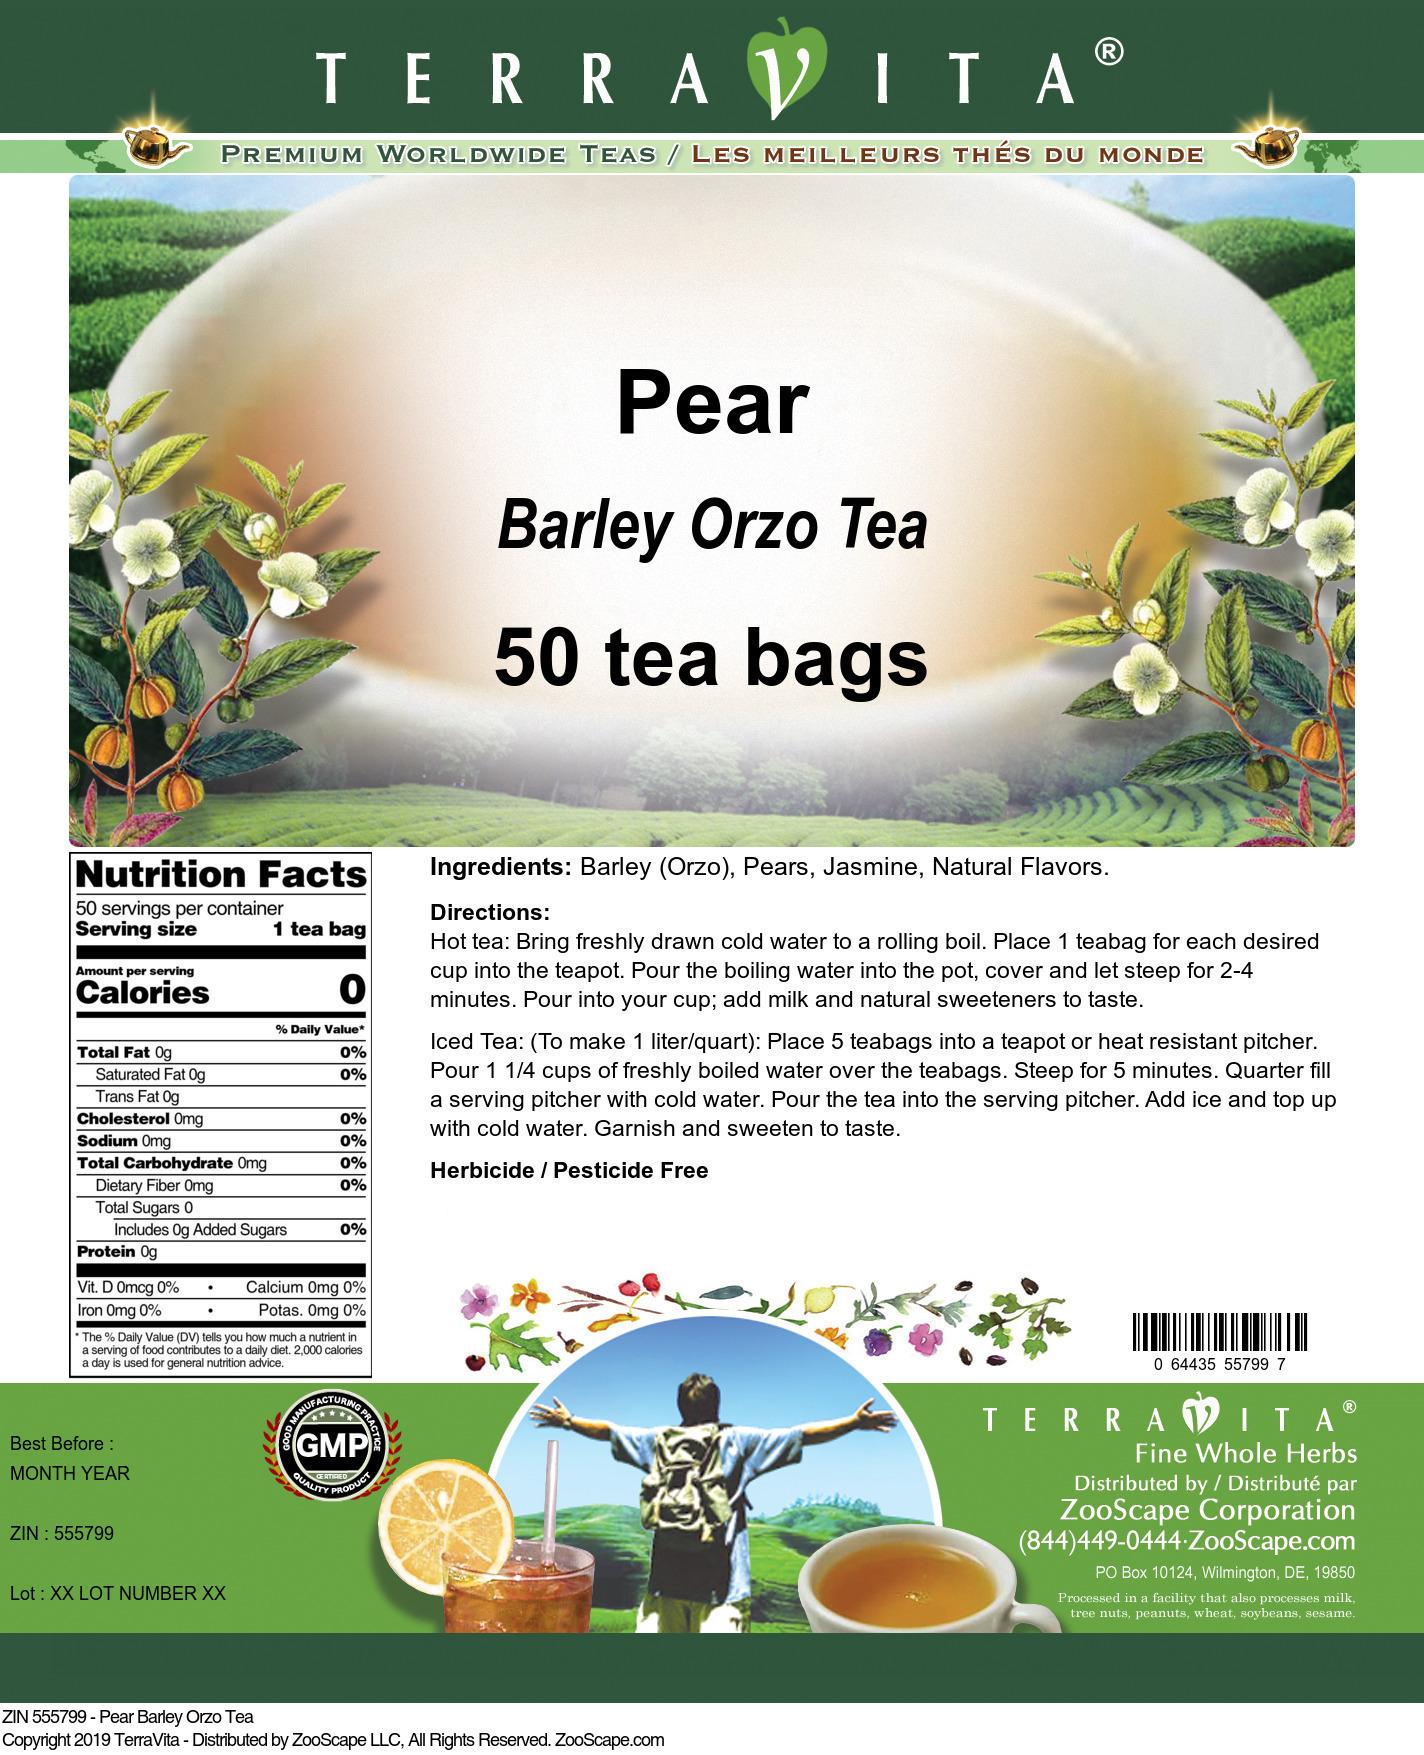 Pear Barley Orzo Tea